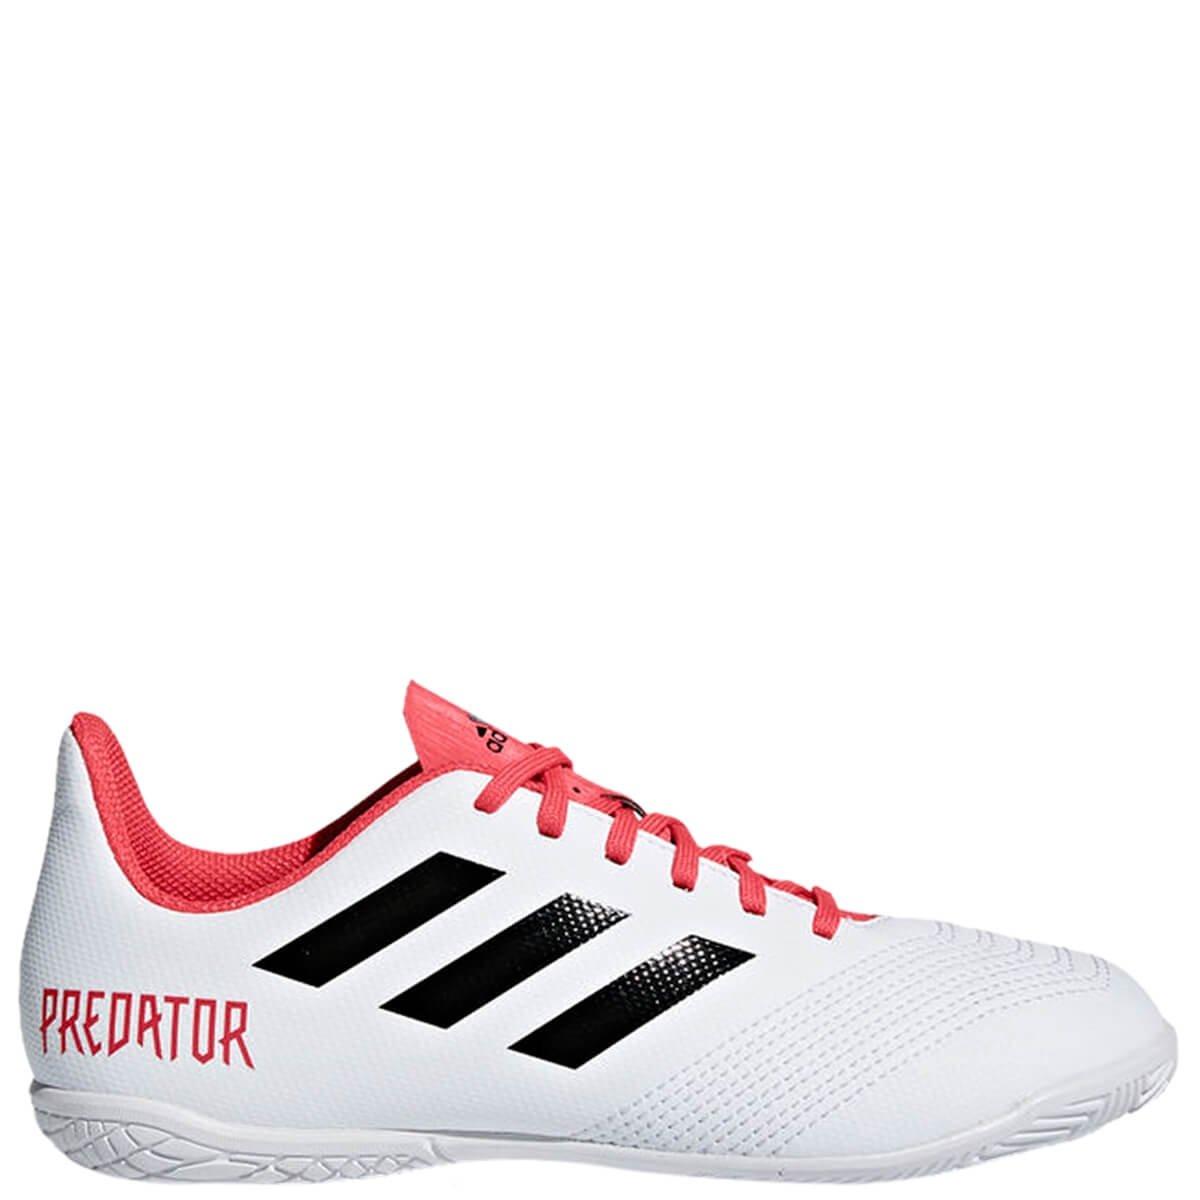 a320fcc60eca9 Chuteira Infantil Futsal Adidas Predator Tango 18.4